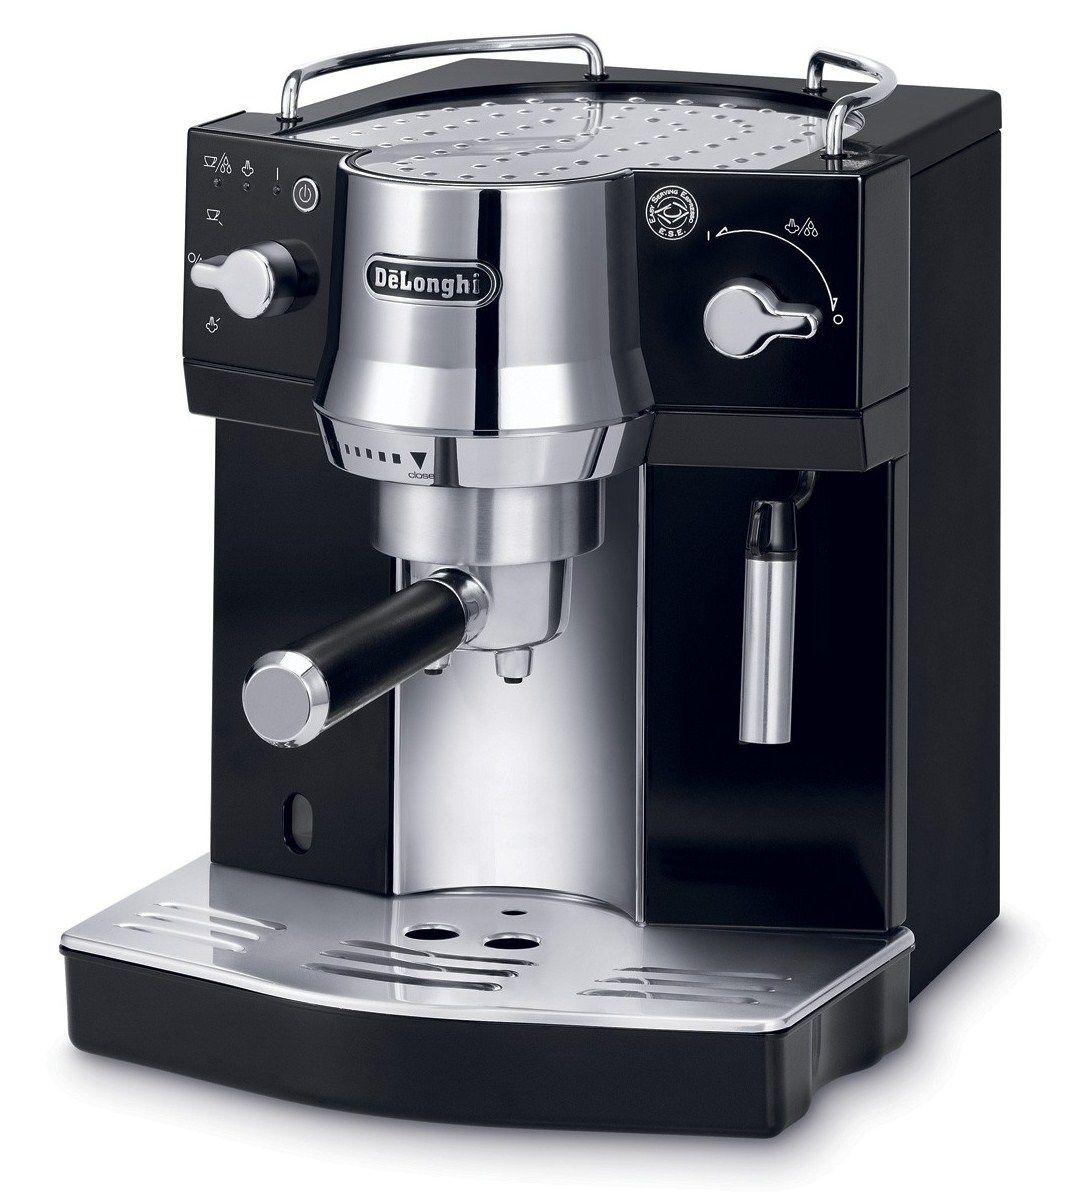 Delonghi Archives De Brewerz Espresso coffee machine